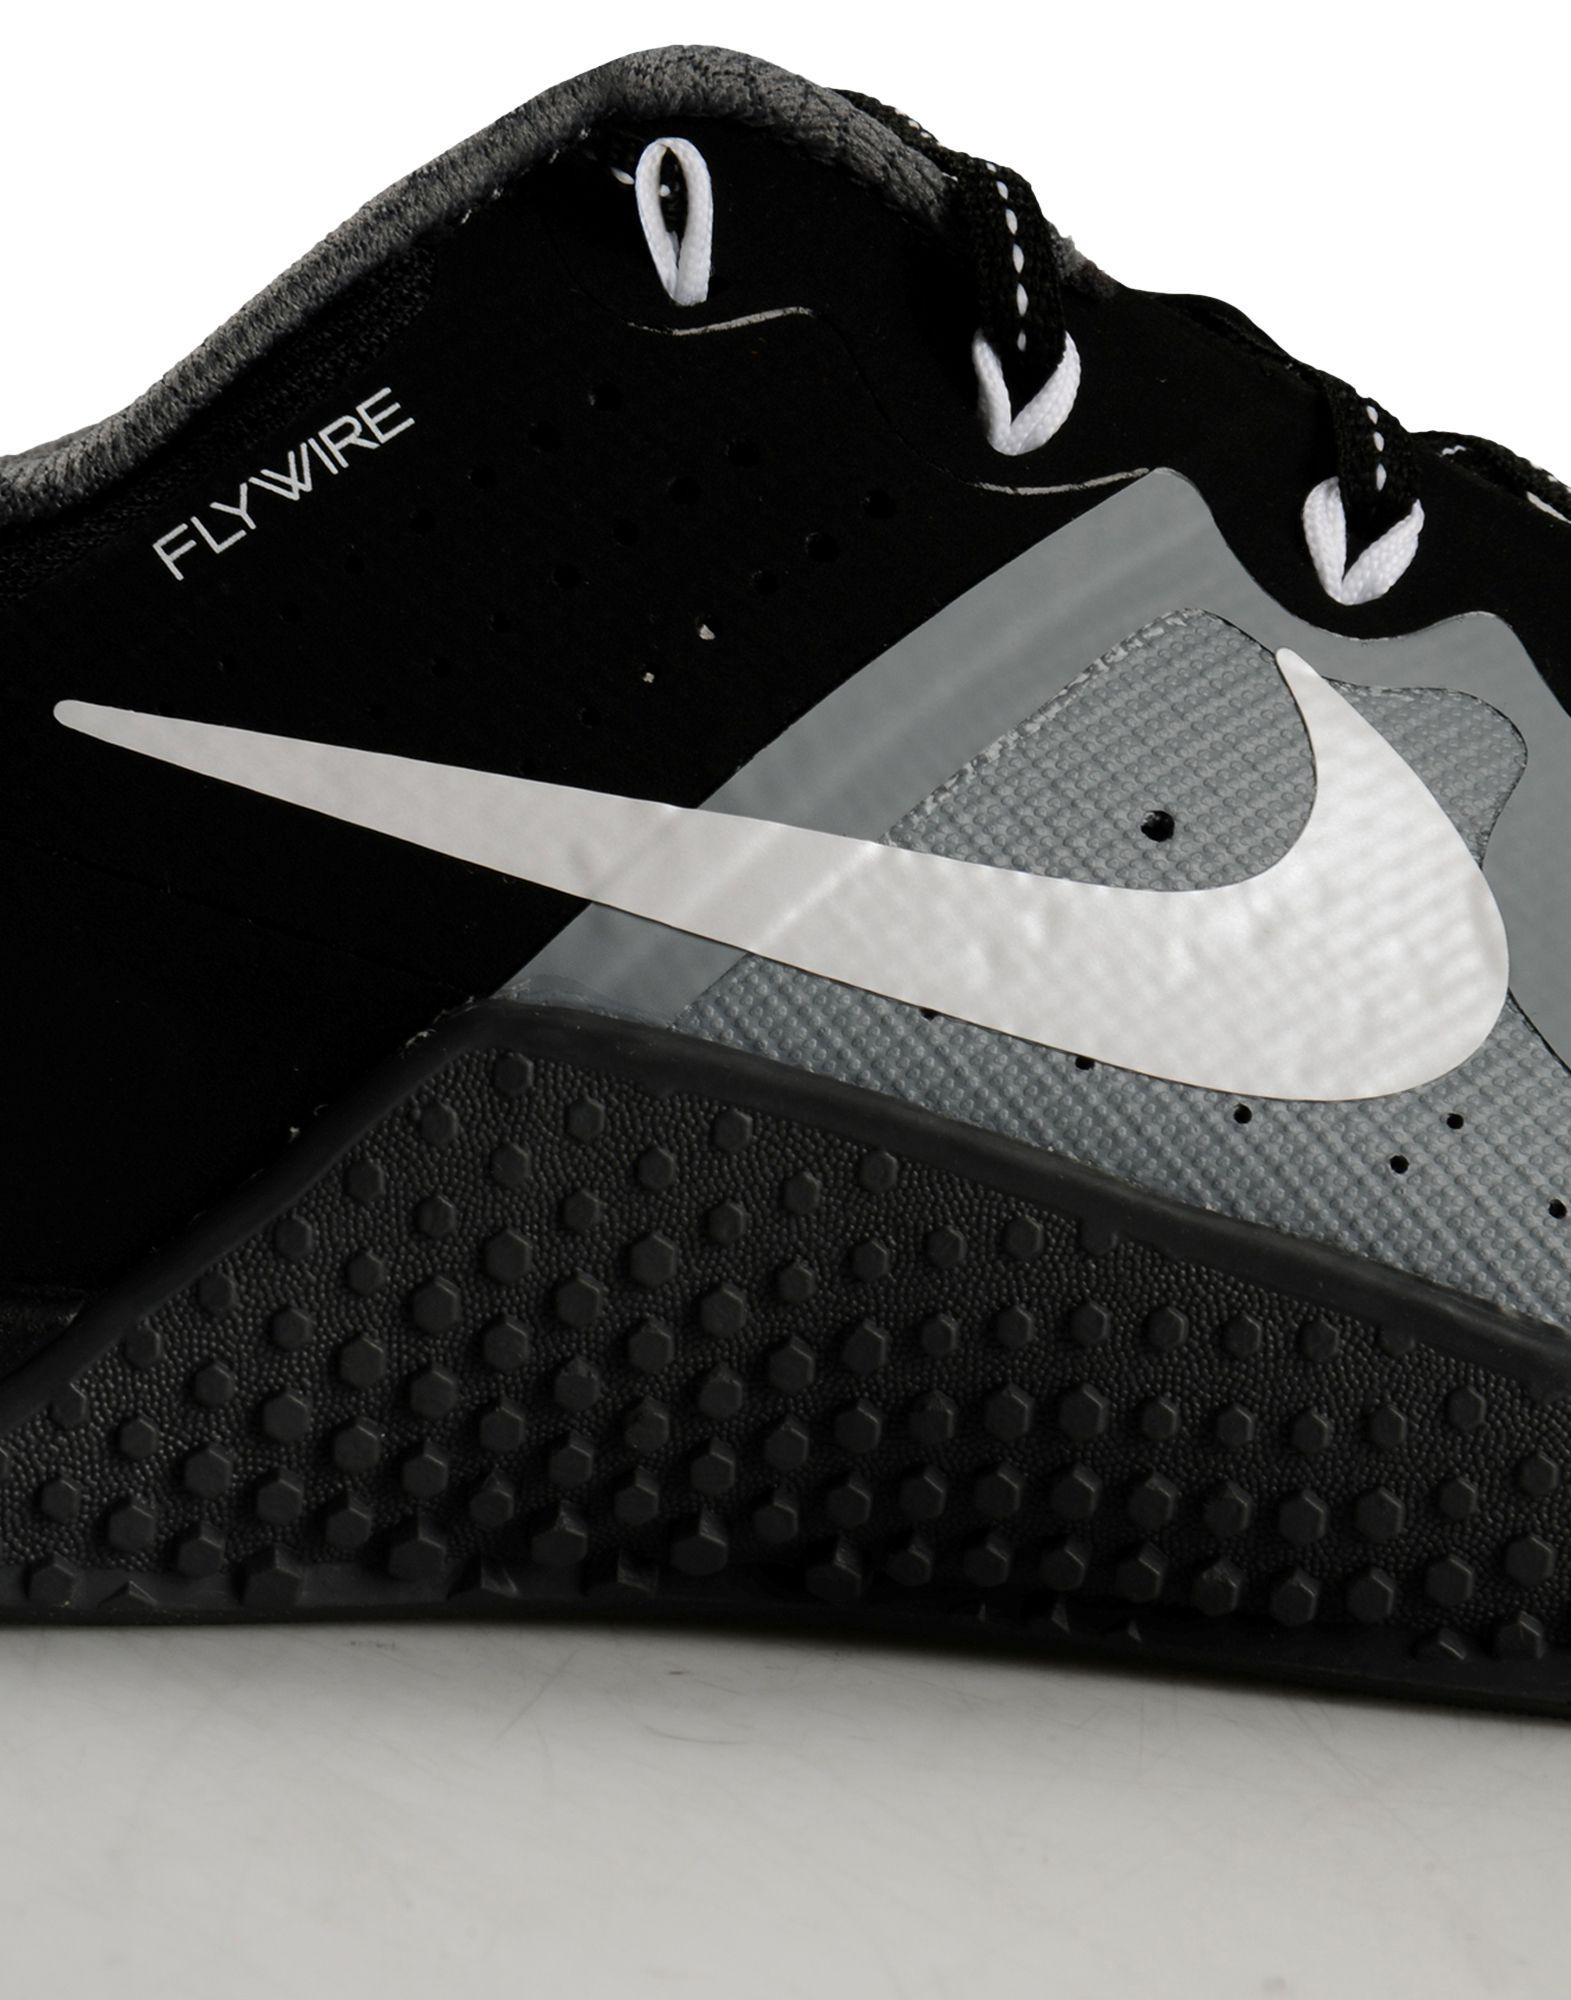 Nike Wmns Nike Metcon 2 - - - Sneakers - Women Nike Sneakers online on  United Kingdom - 11002945DX 89f186